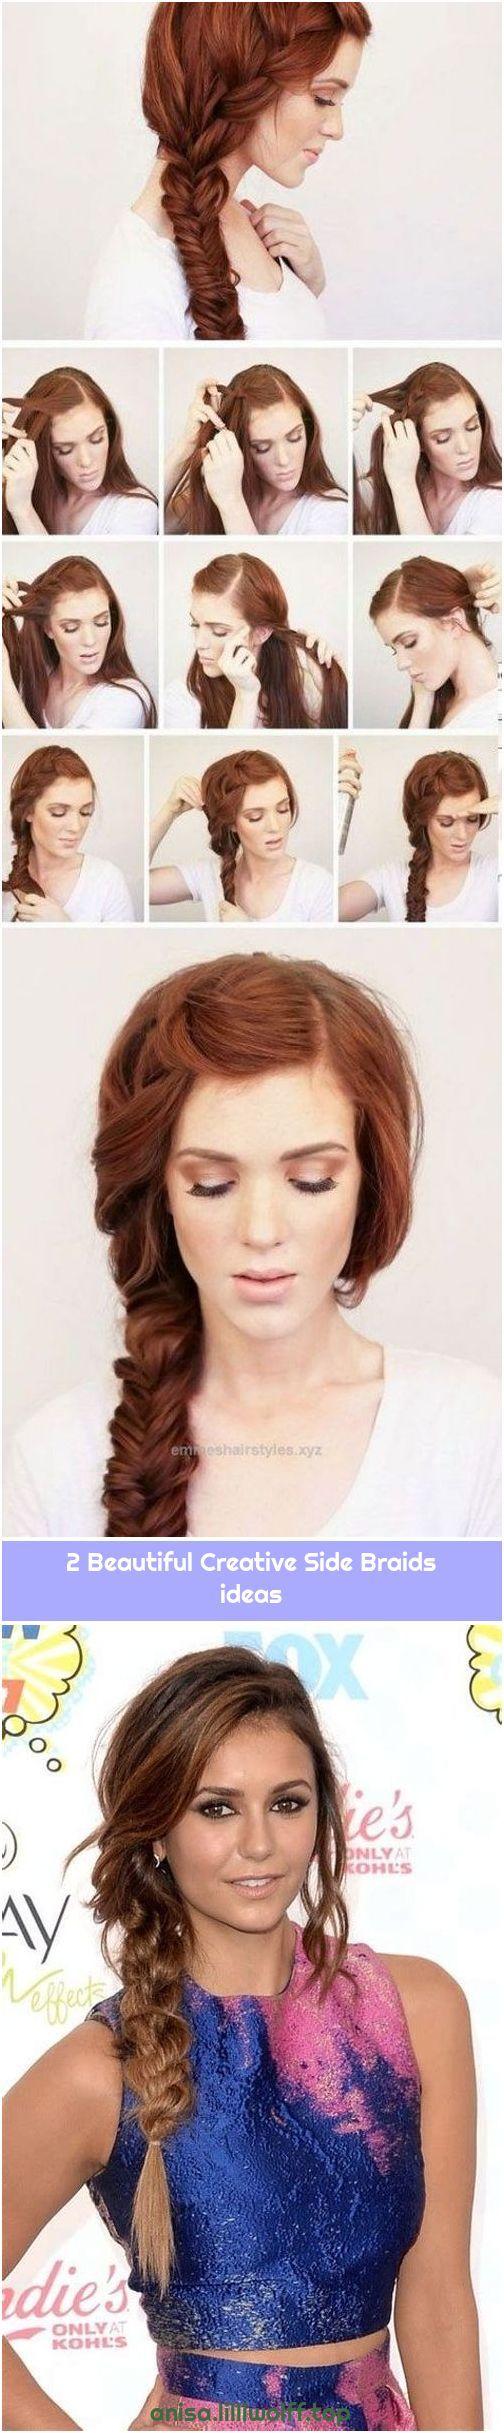 2 Beautiful Creative Side Braids ideas #sidebraidhairstyles